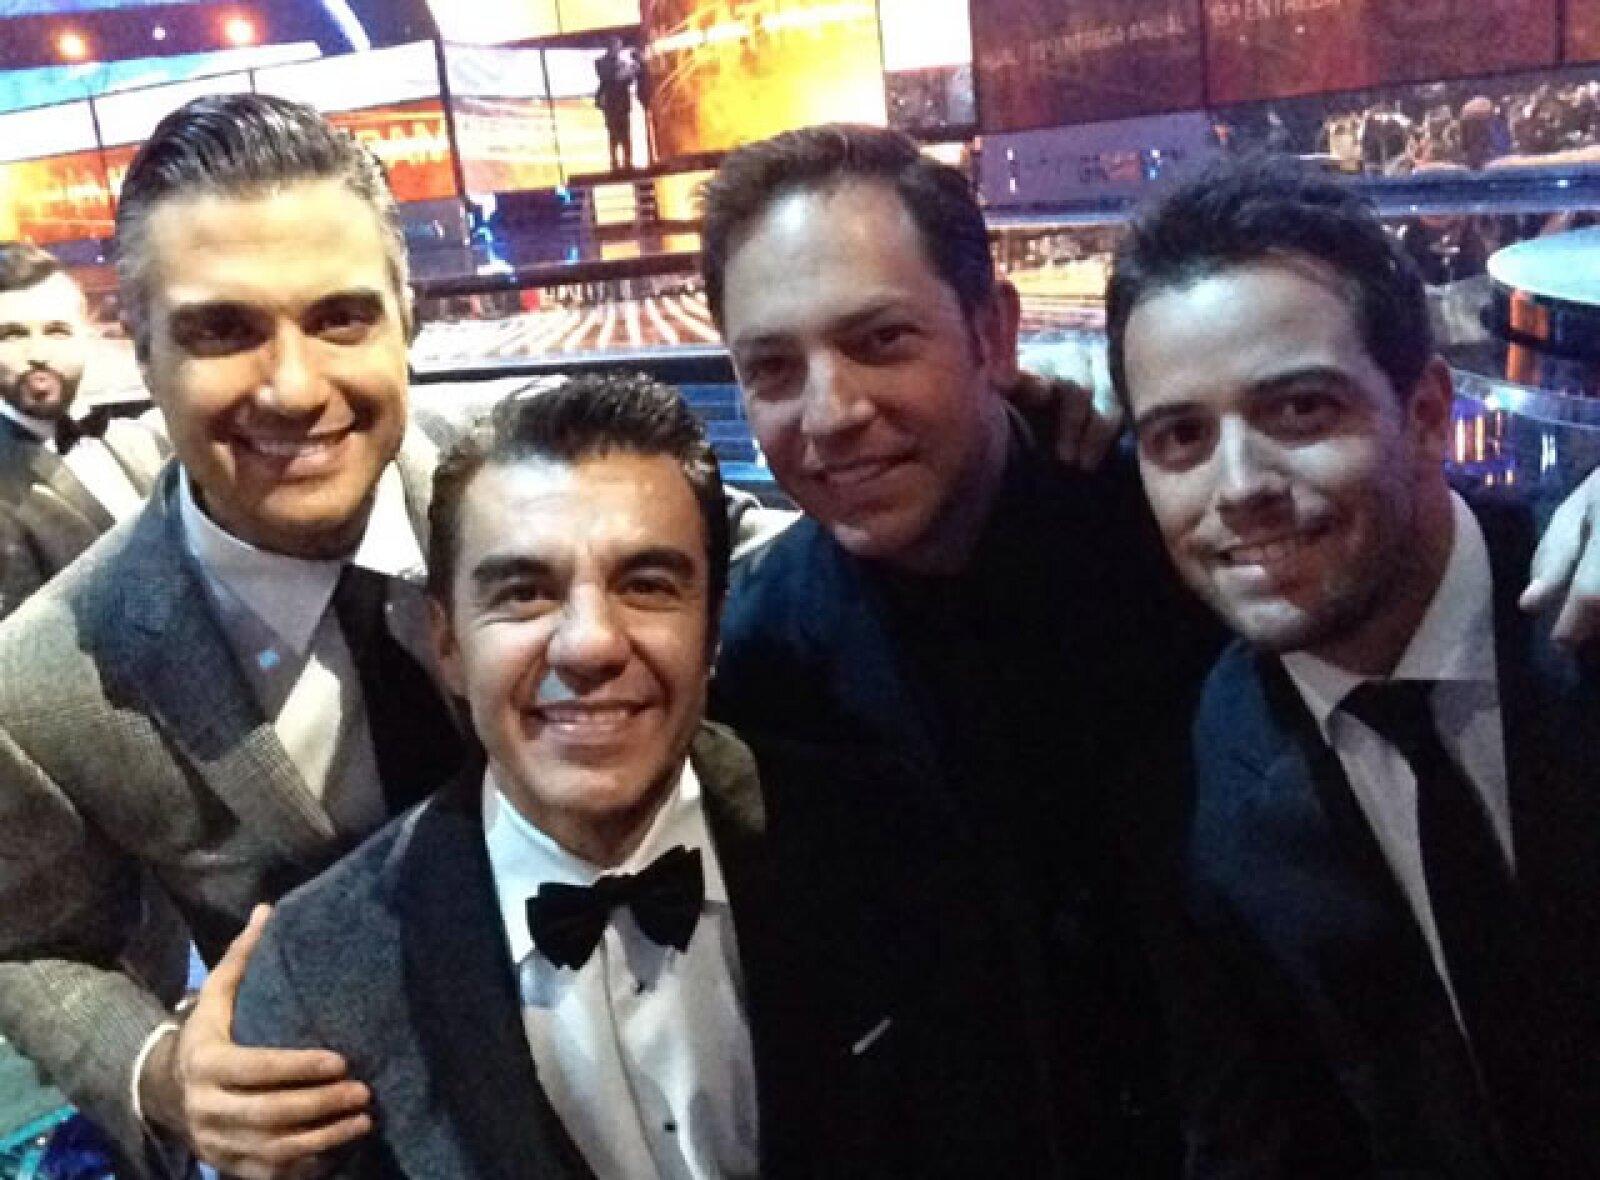 Jaime Camil, Adrián Uribe, Jan y Mane de la Parra se tomaron esta selfie.